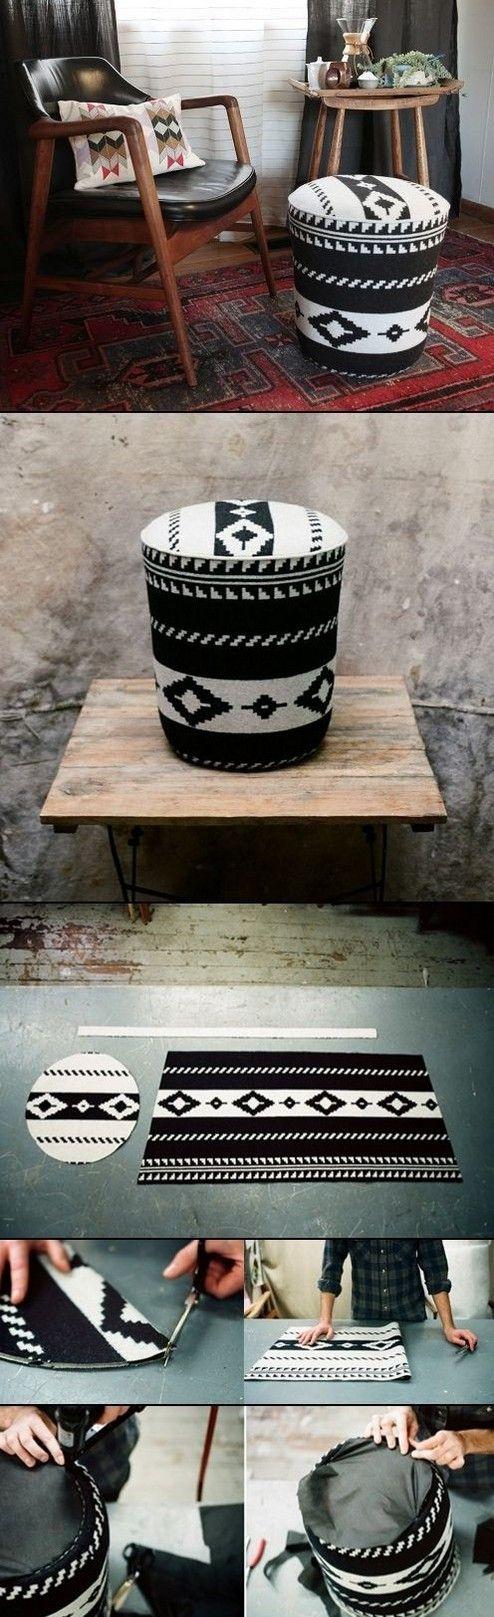 diy utility bucket ottoman diy pinterest. Black Bedroom Furniture Sets. Home Design Ideas